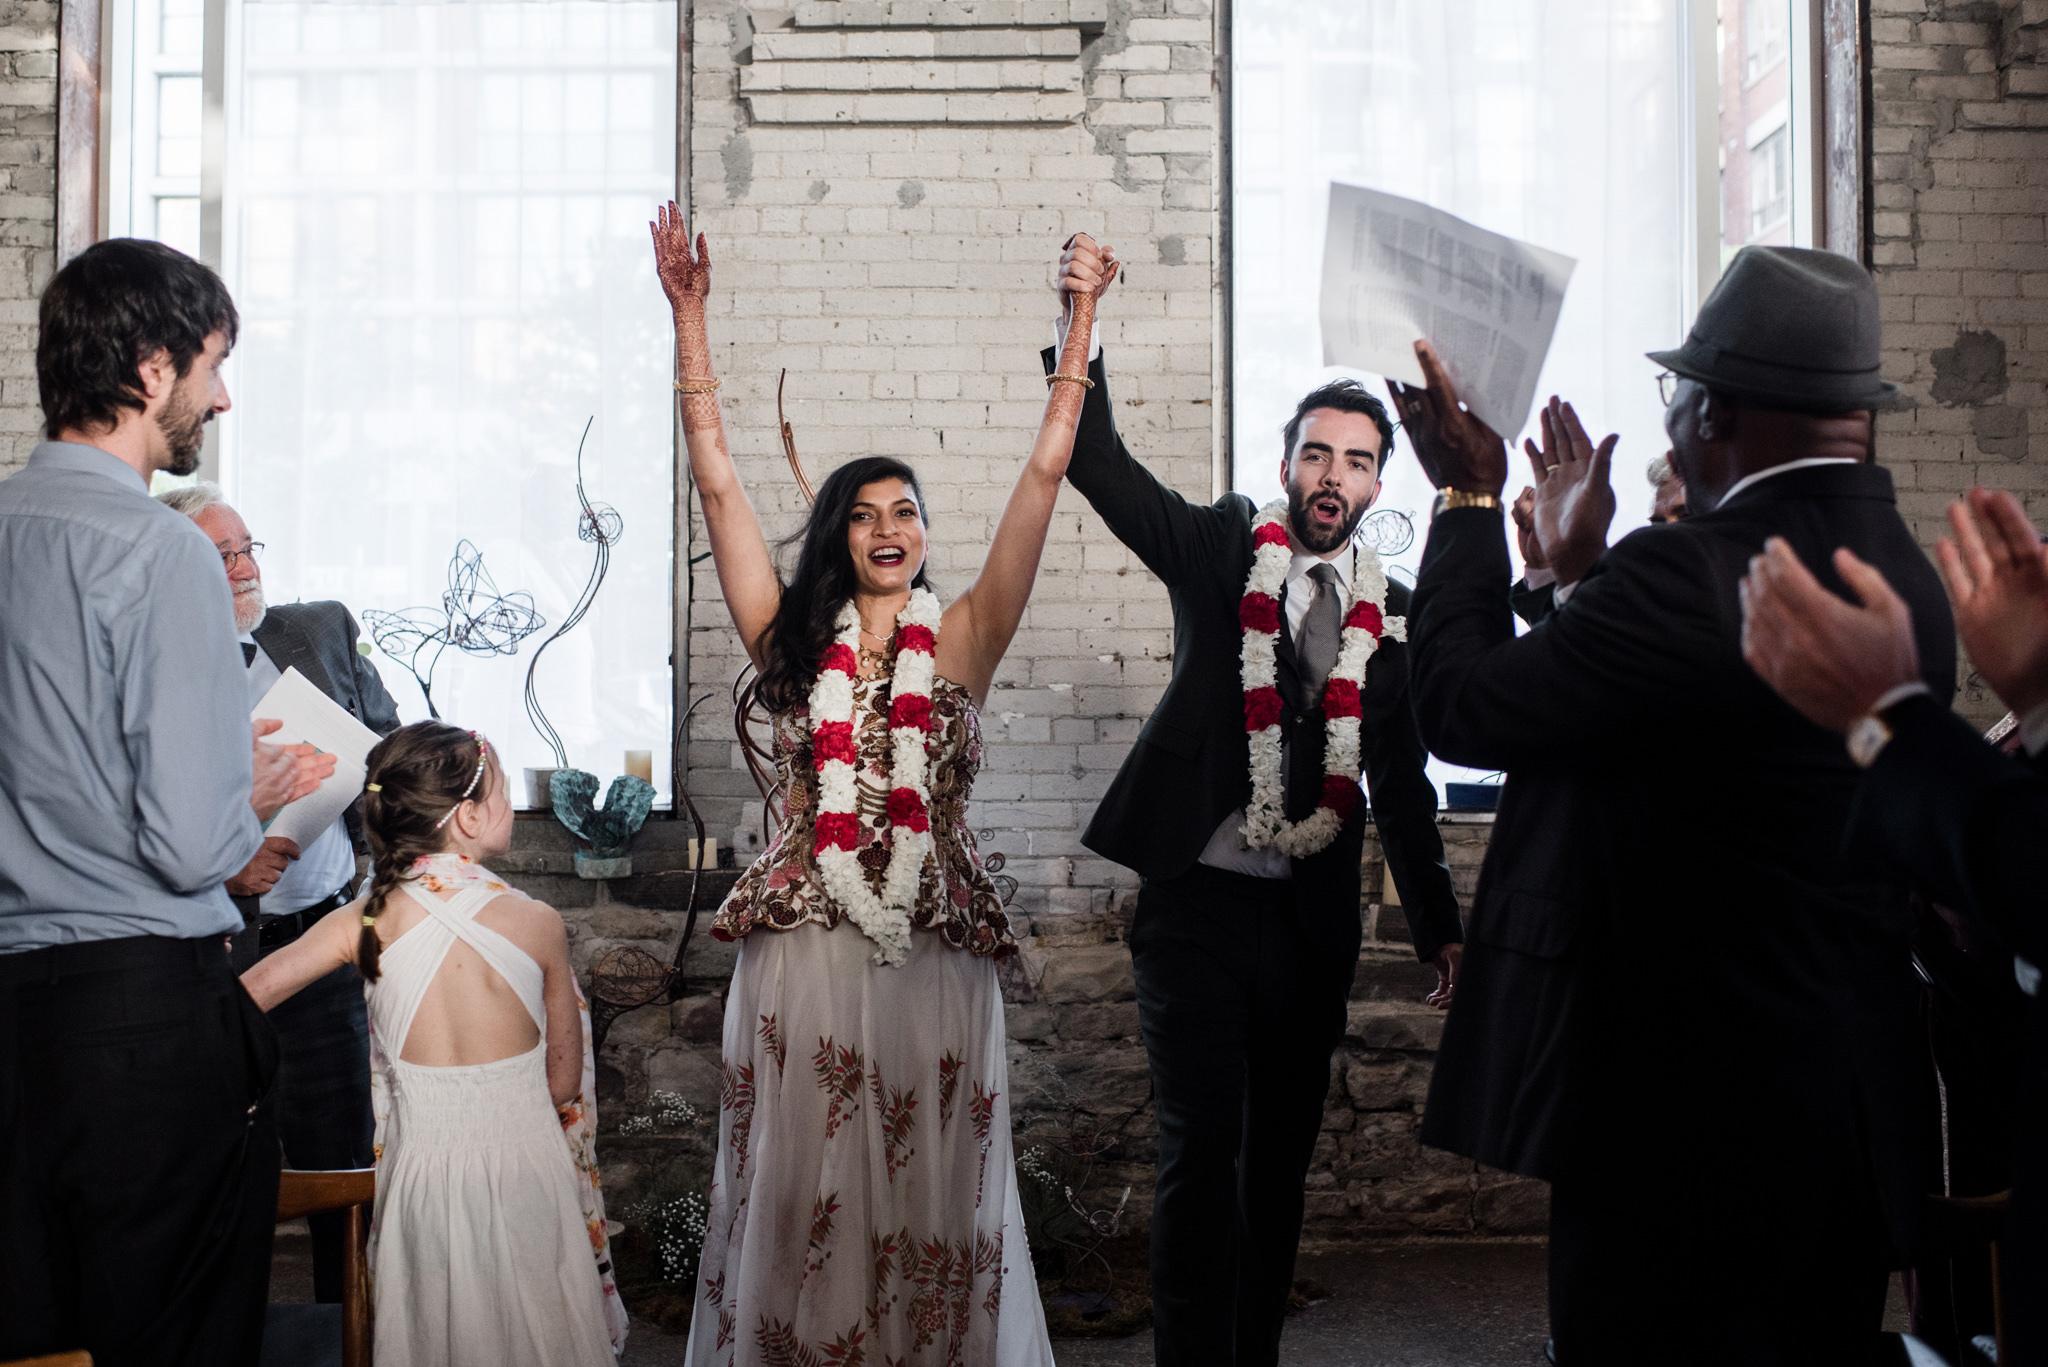 066-wedding-ceremony-reception-recessional-bride-groom-exit-photographer.jpg